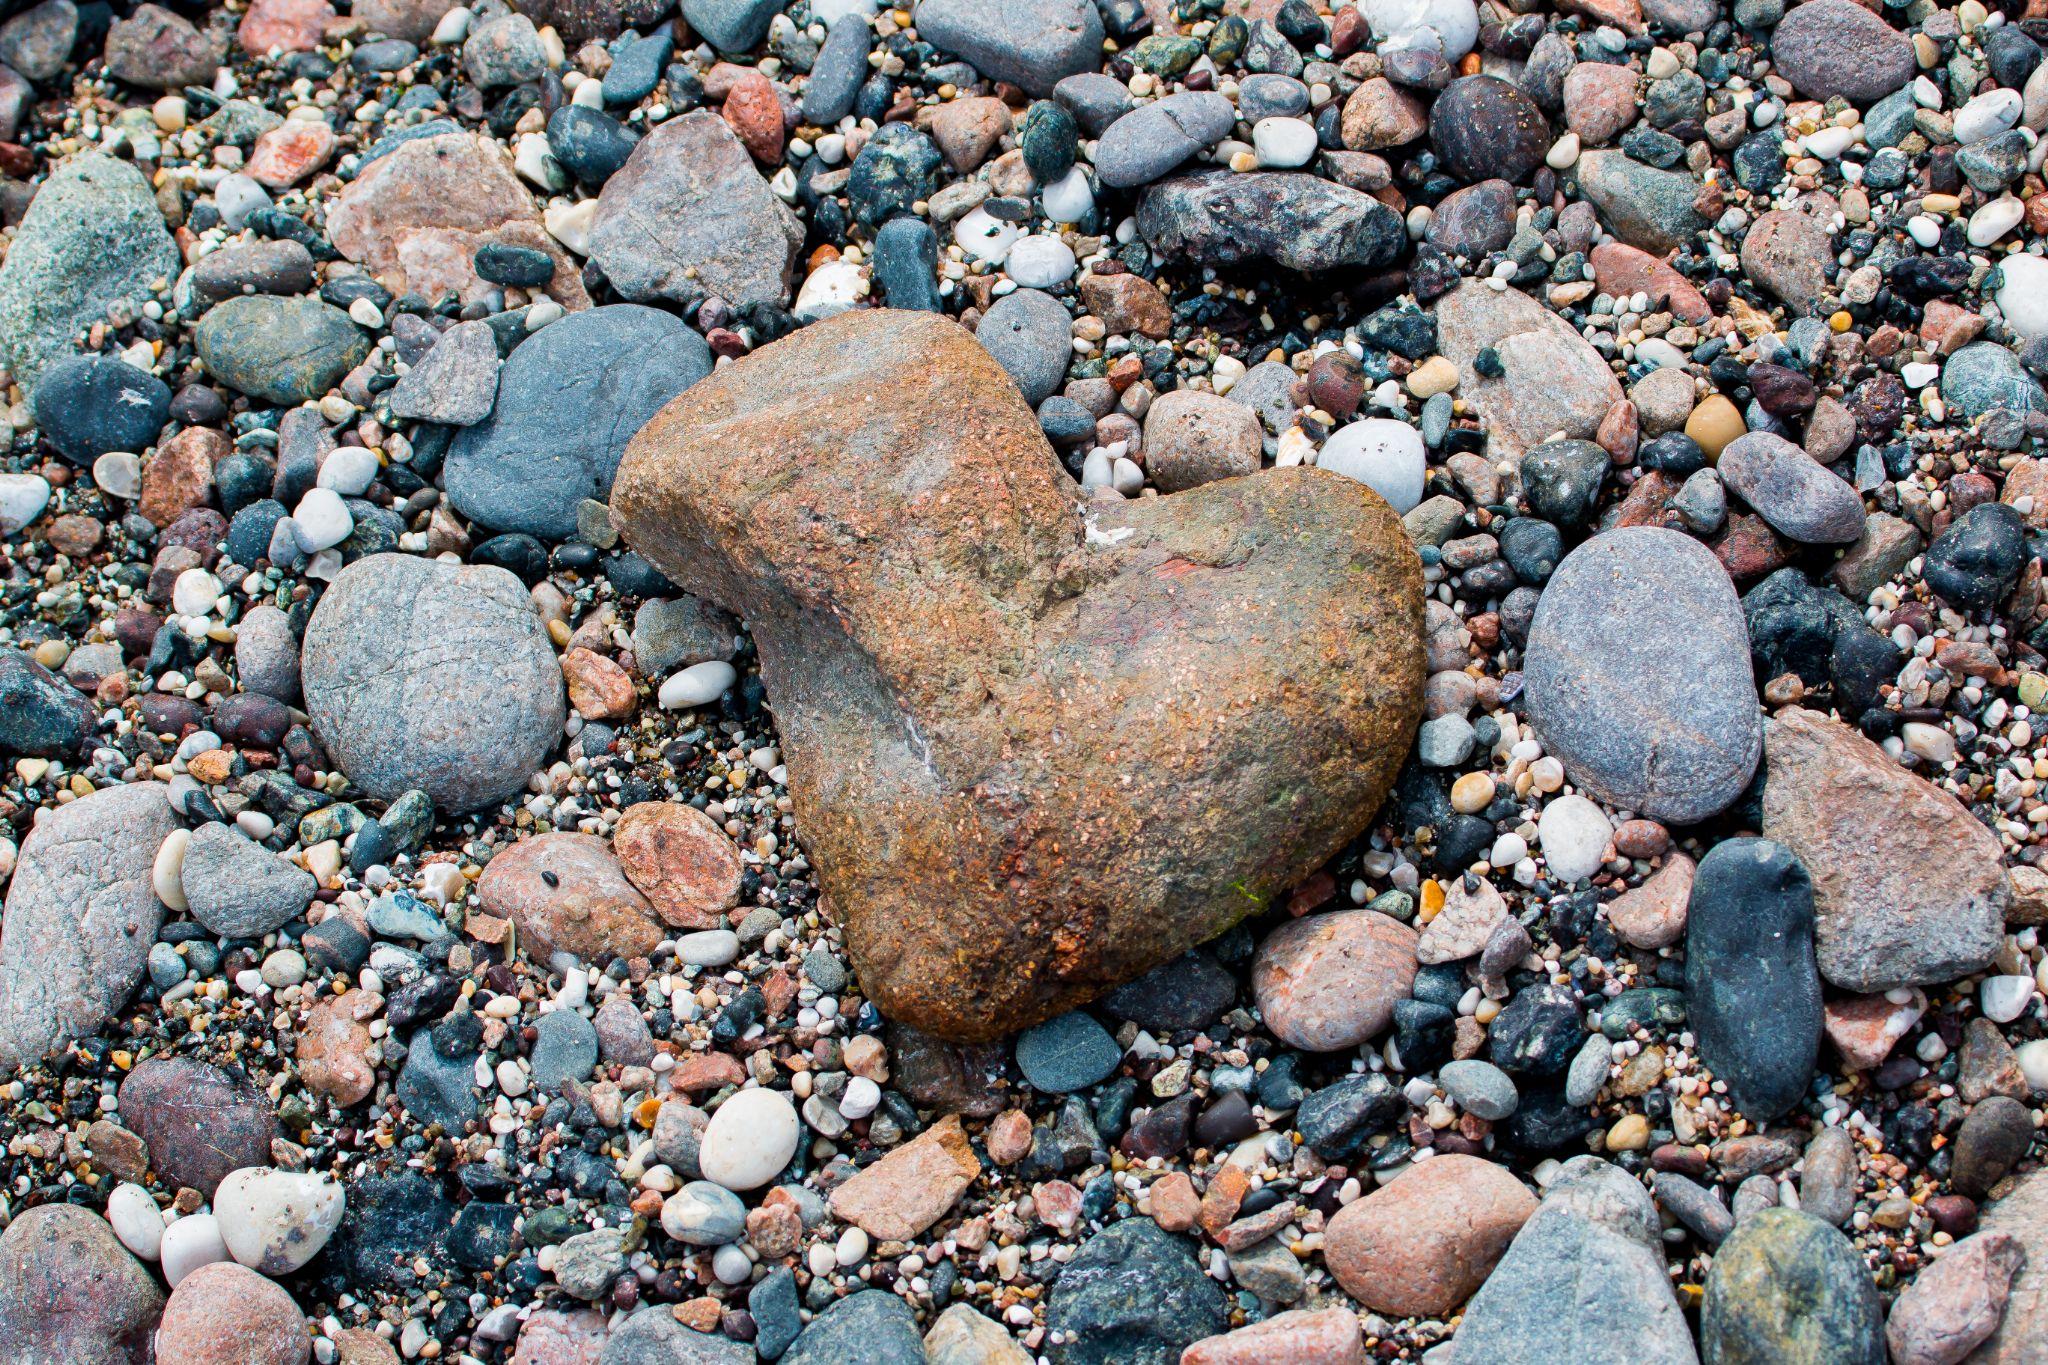 Heart of Stone by Gareth Sawbridge